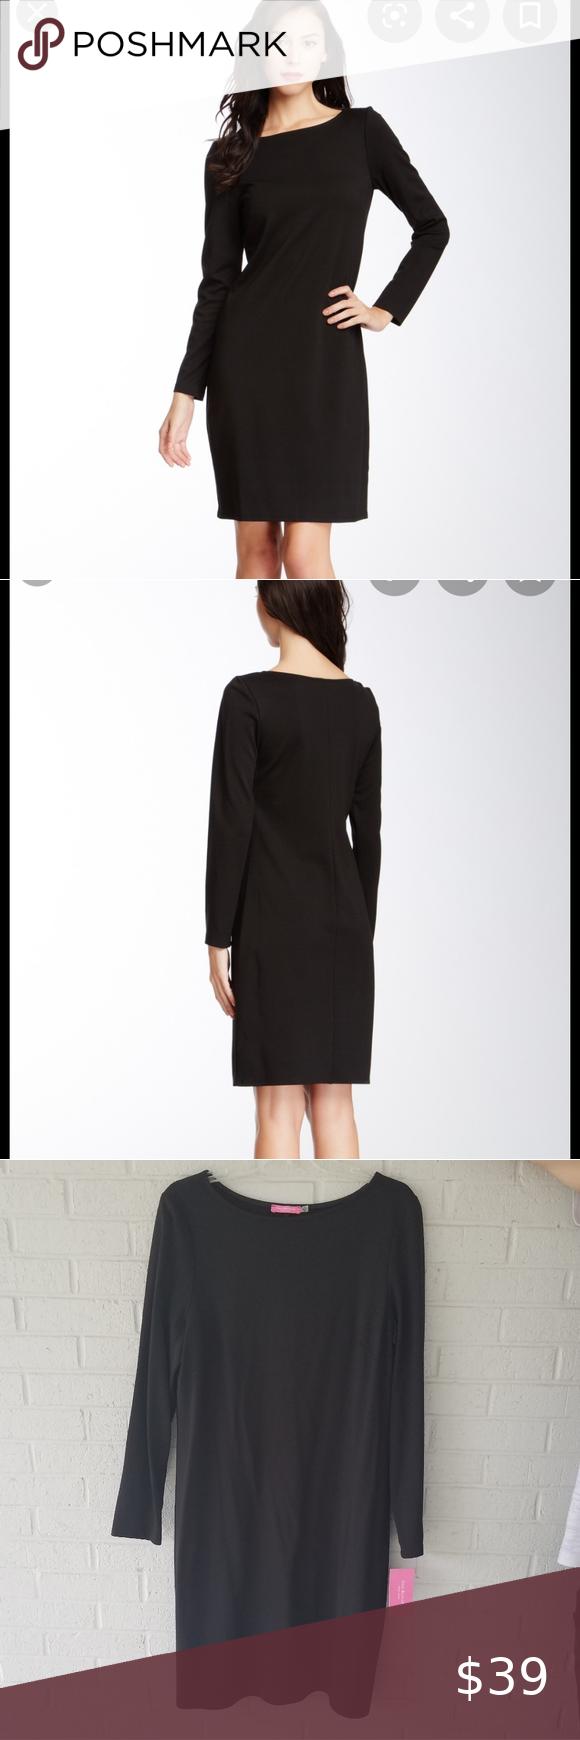 Sold Isaac Mizrahi Nwt Black Dress Long Sleeve Sheath Dress Black Dress Clothes Design [ 1740 x 580 Pixel ]